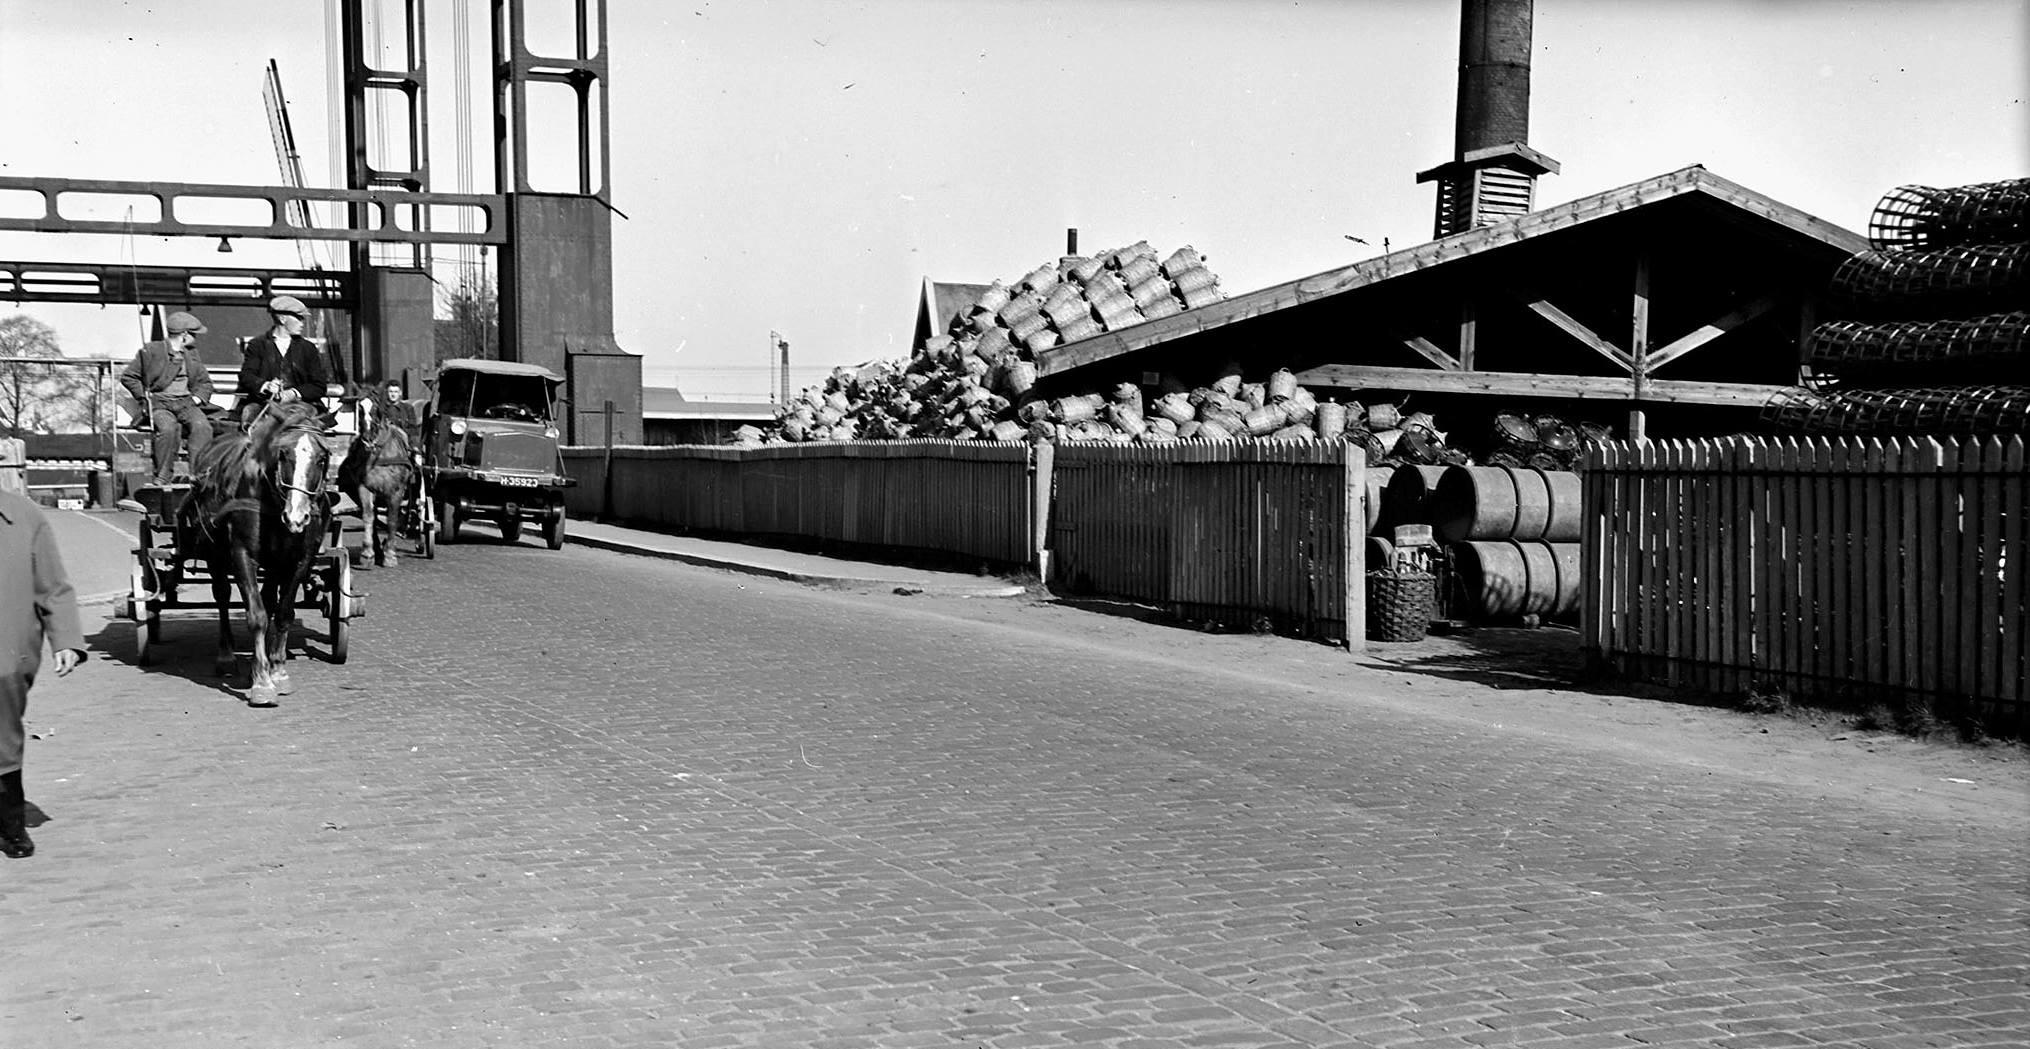 1938-Dordrecht--s-Gravendeelsedijk-H-35923-Hansa-Lloyd[1]